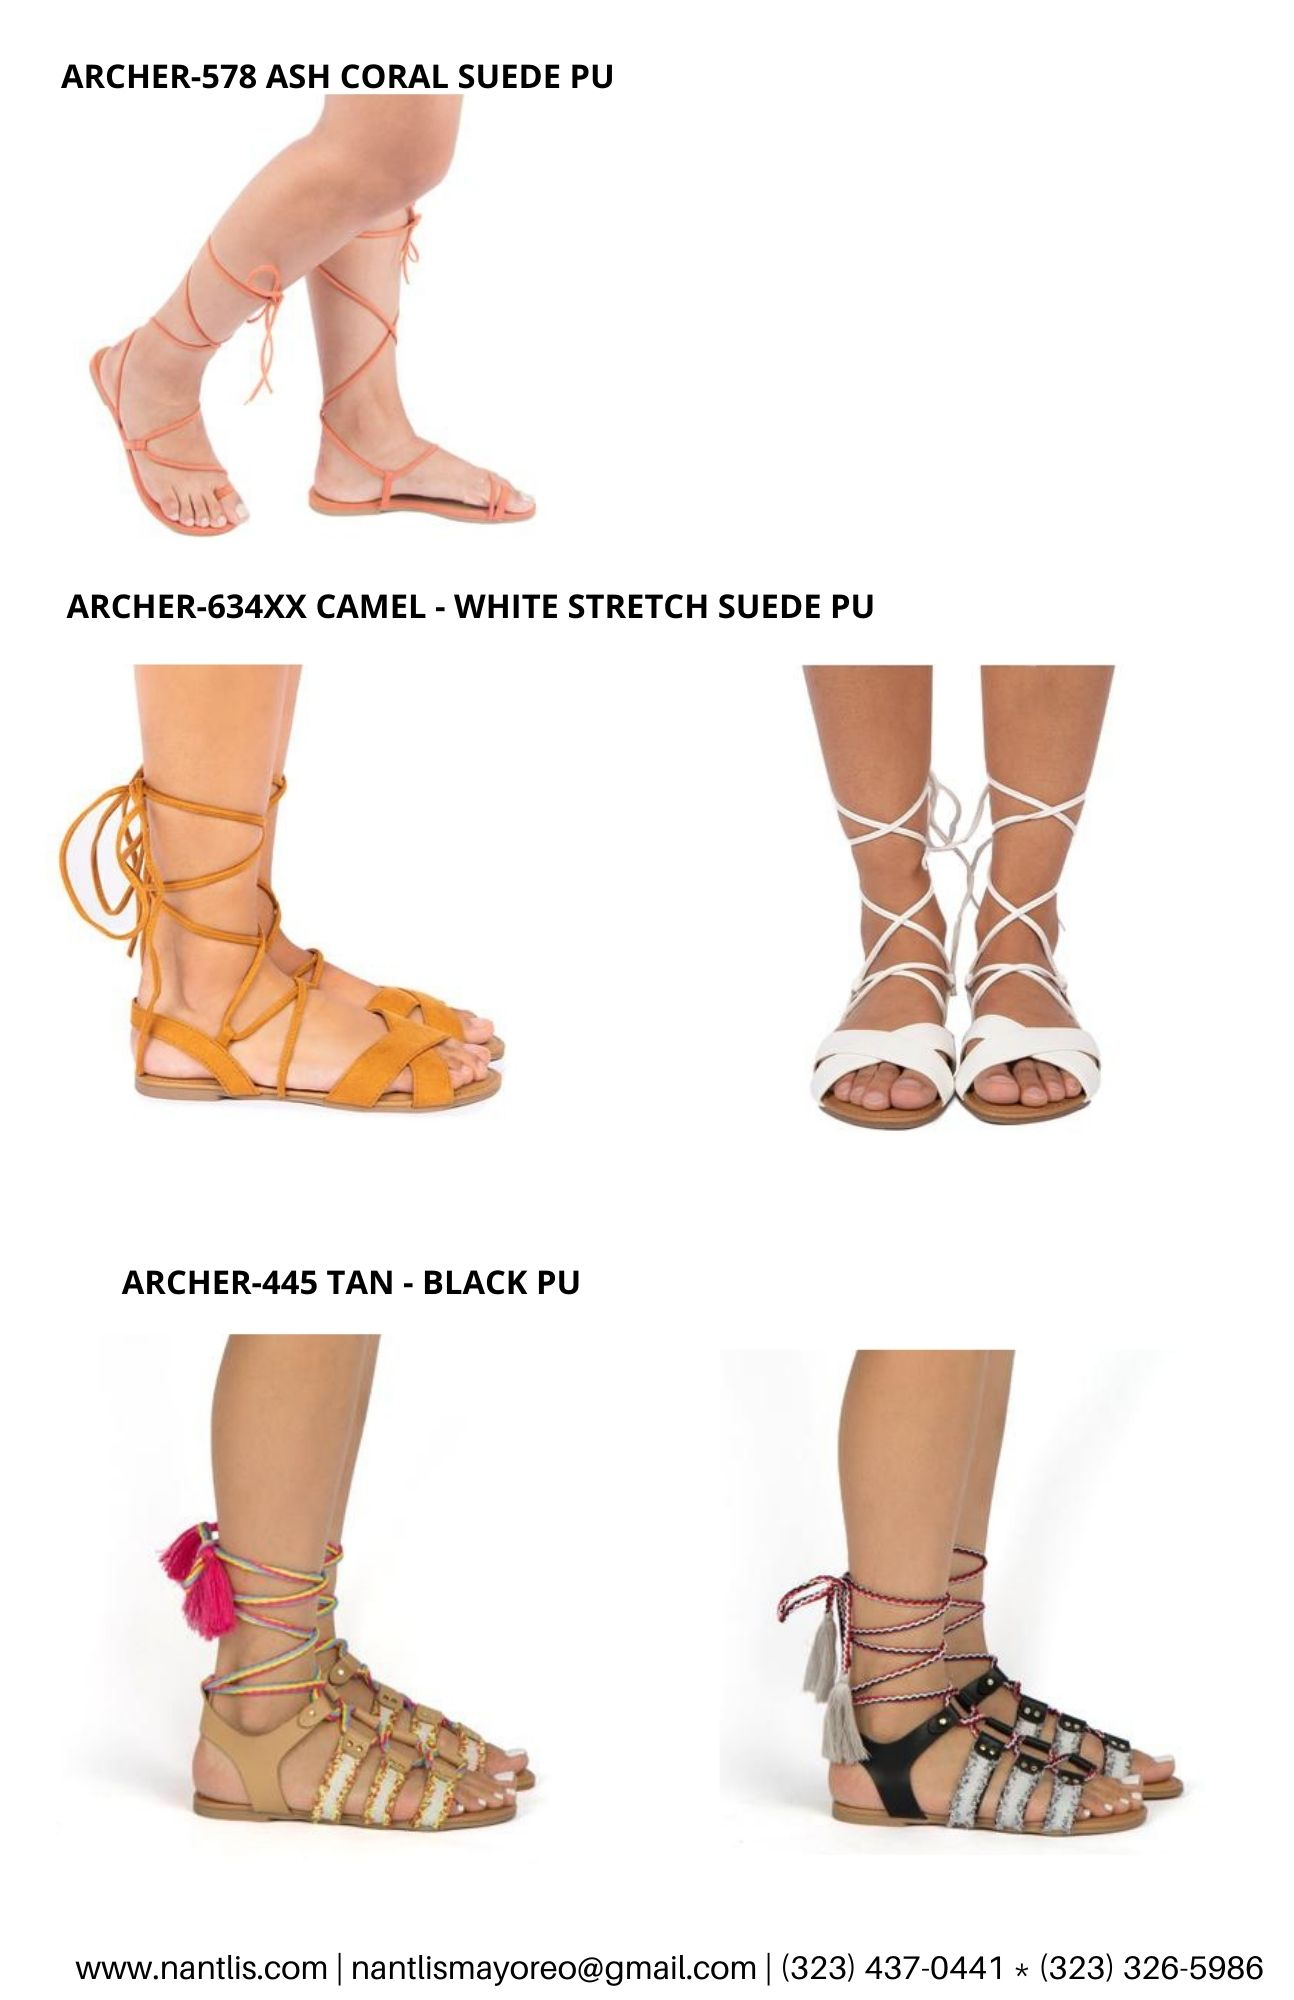 Catalogo Vol QU44 Sandalias de mujer mayoreo Wholesale Sandals page 02